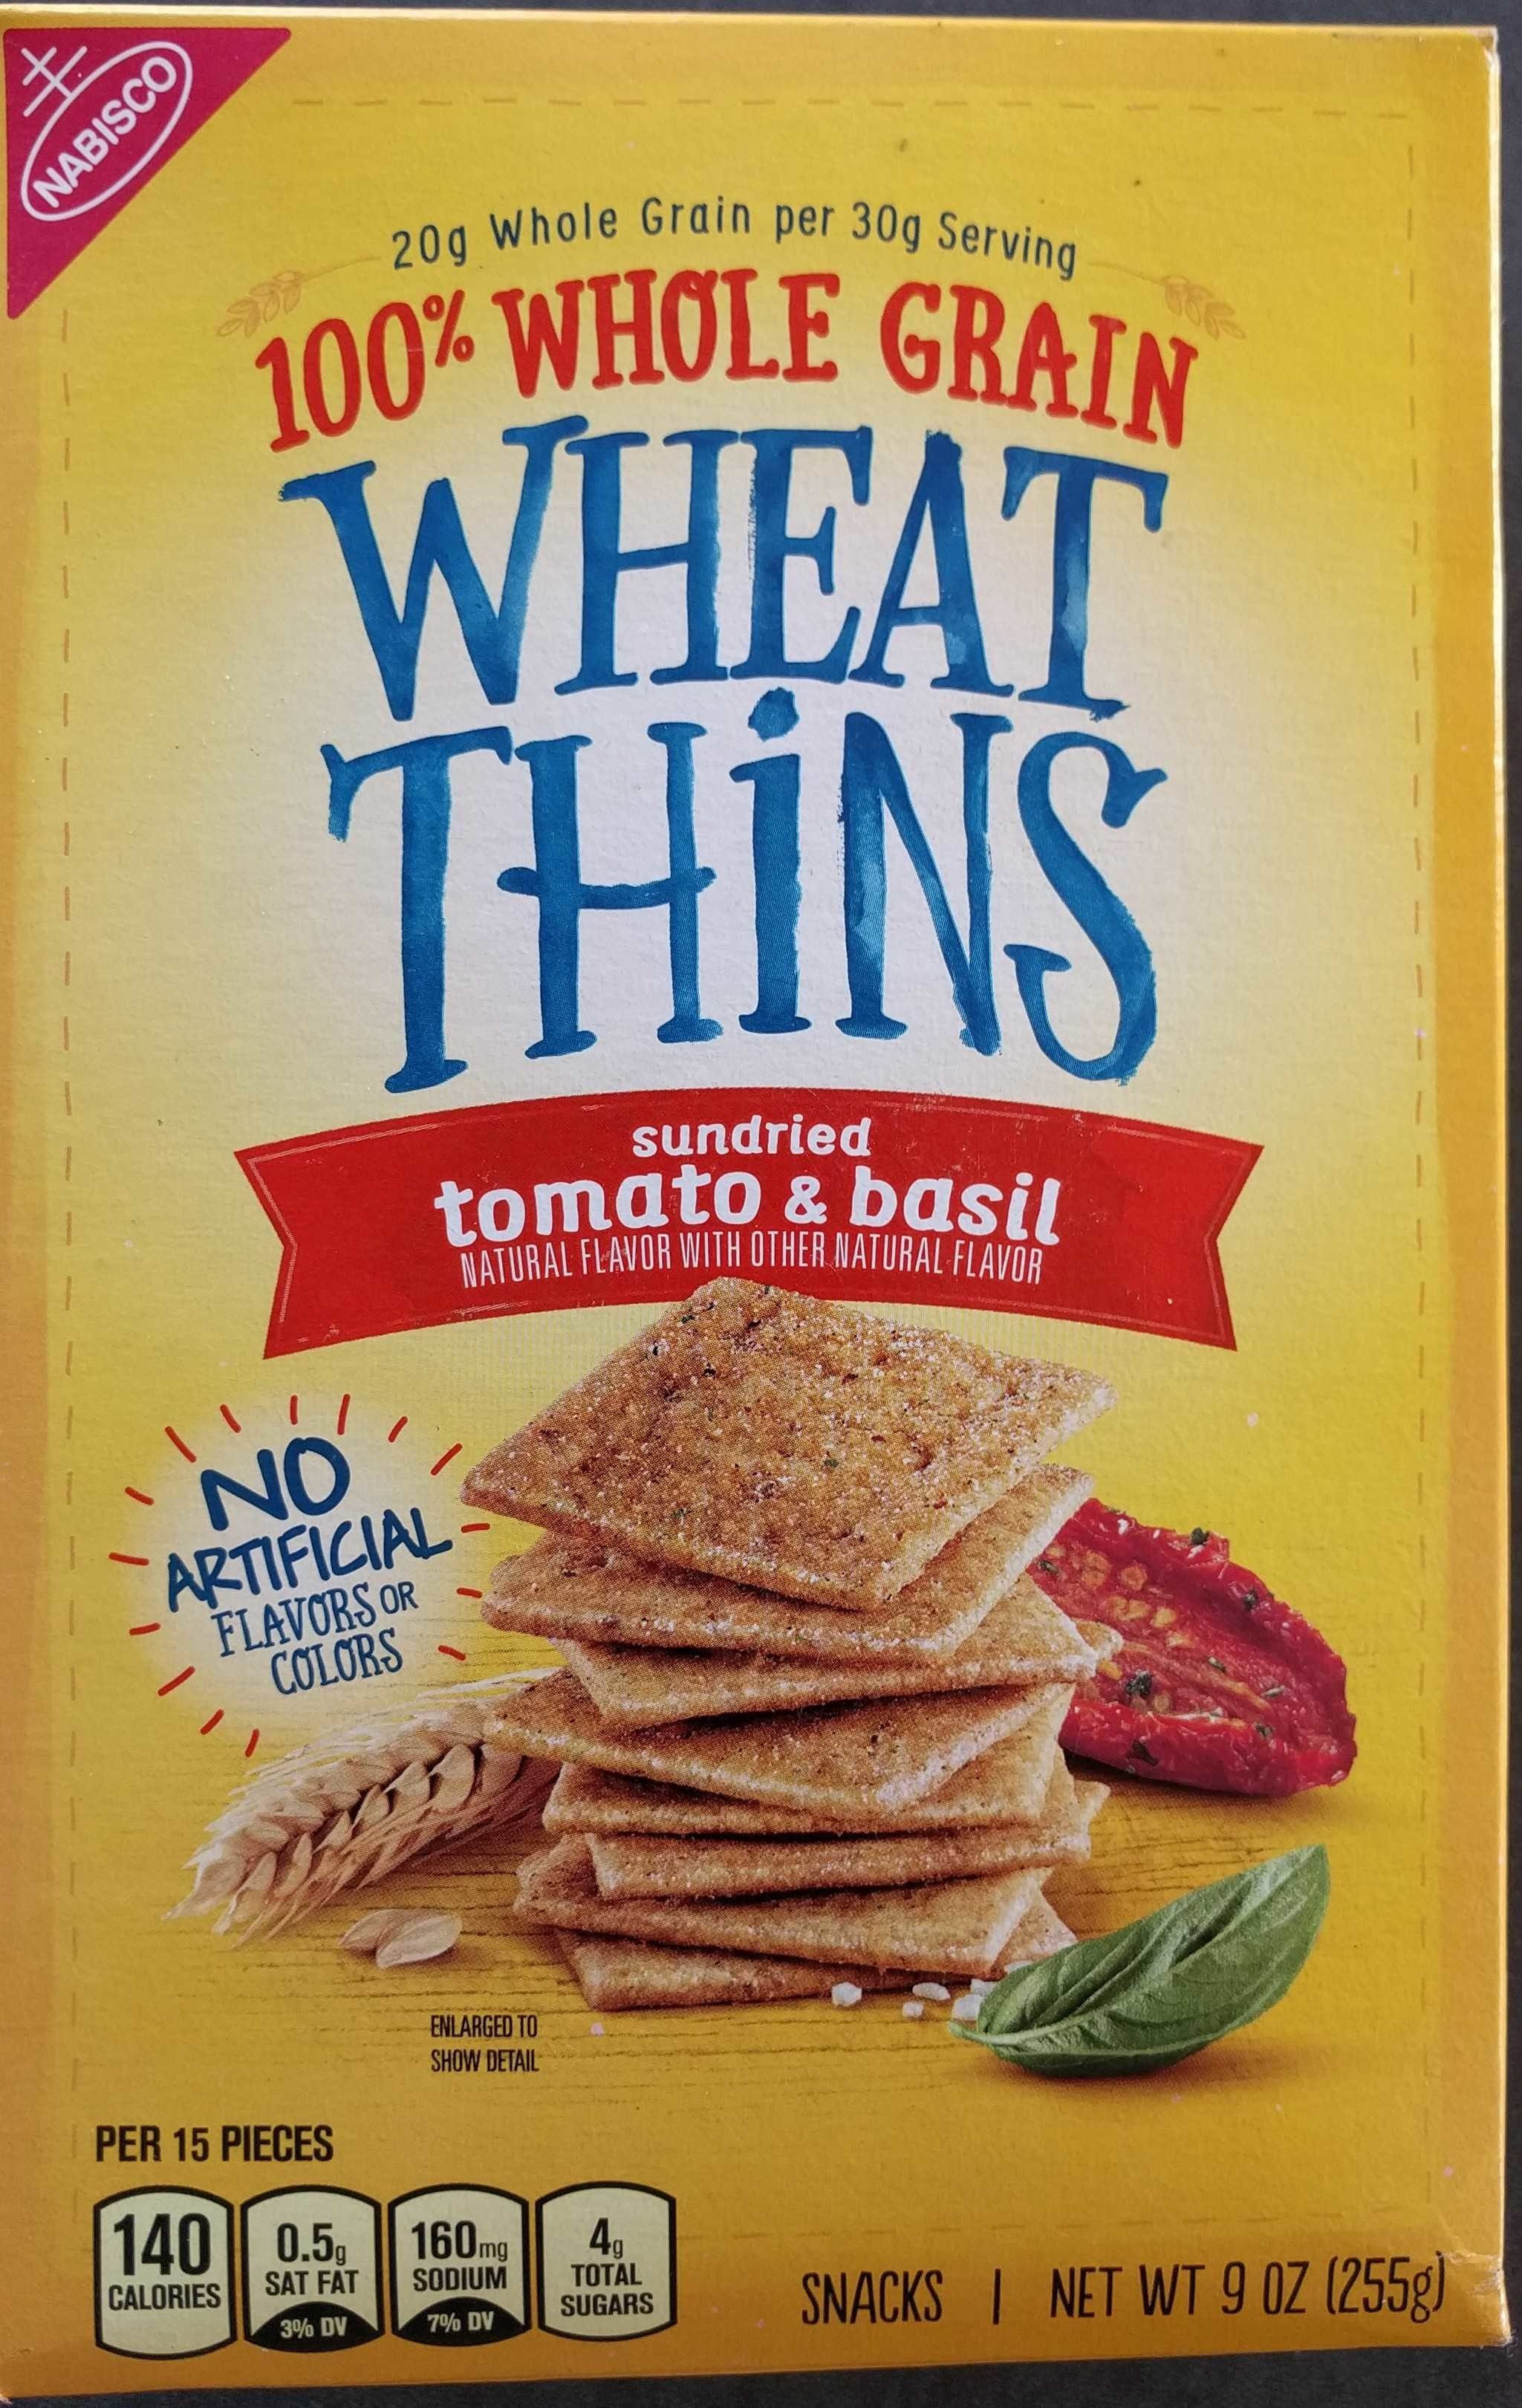 Nabisco wheat thins crackers sun dried tomato & basil 1x9 oz - Produit - en